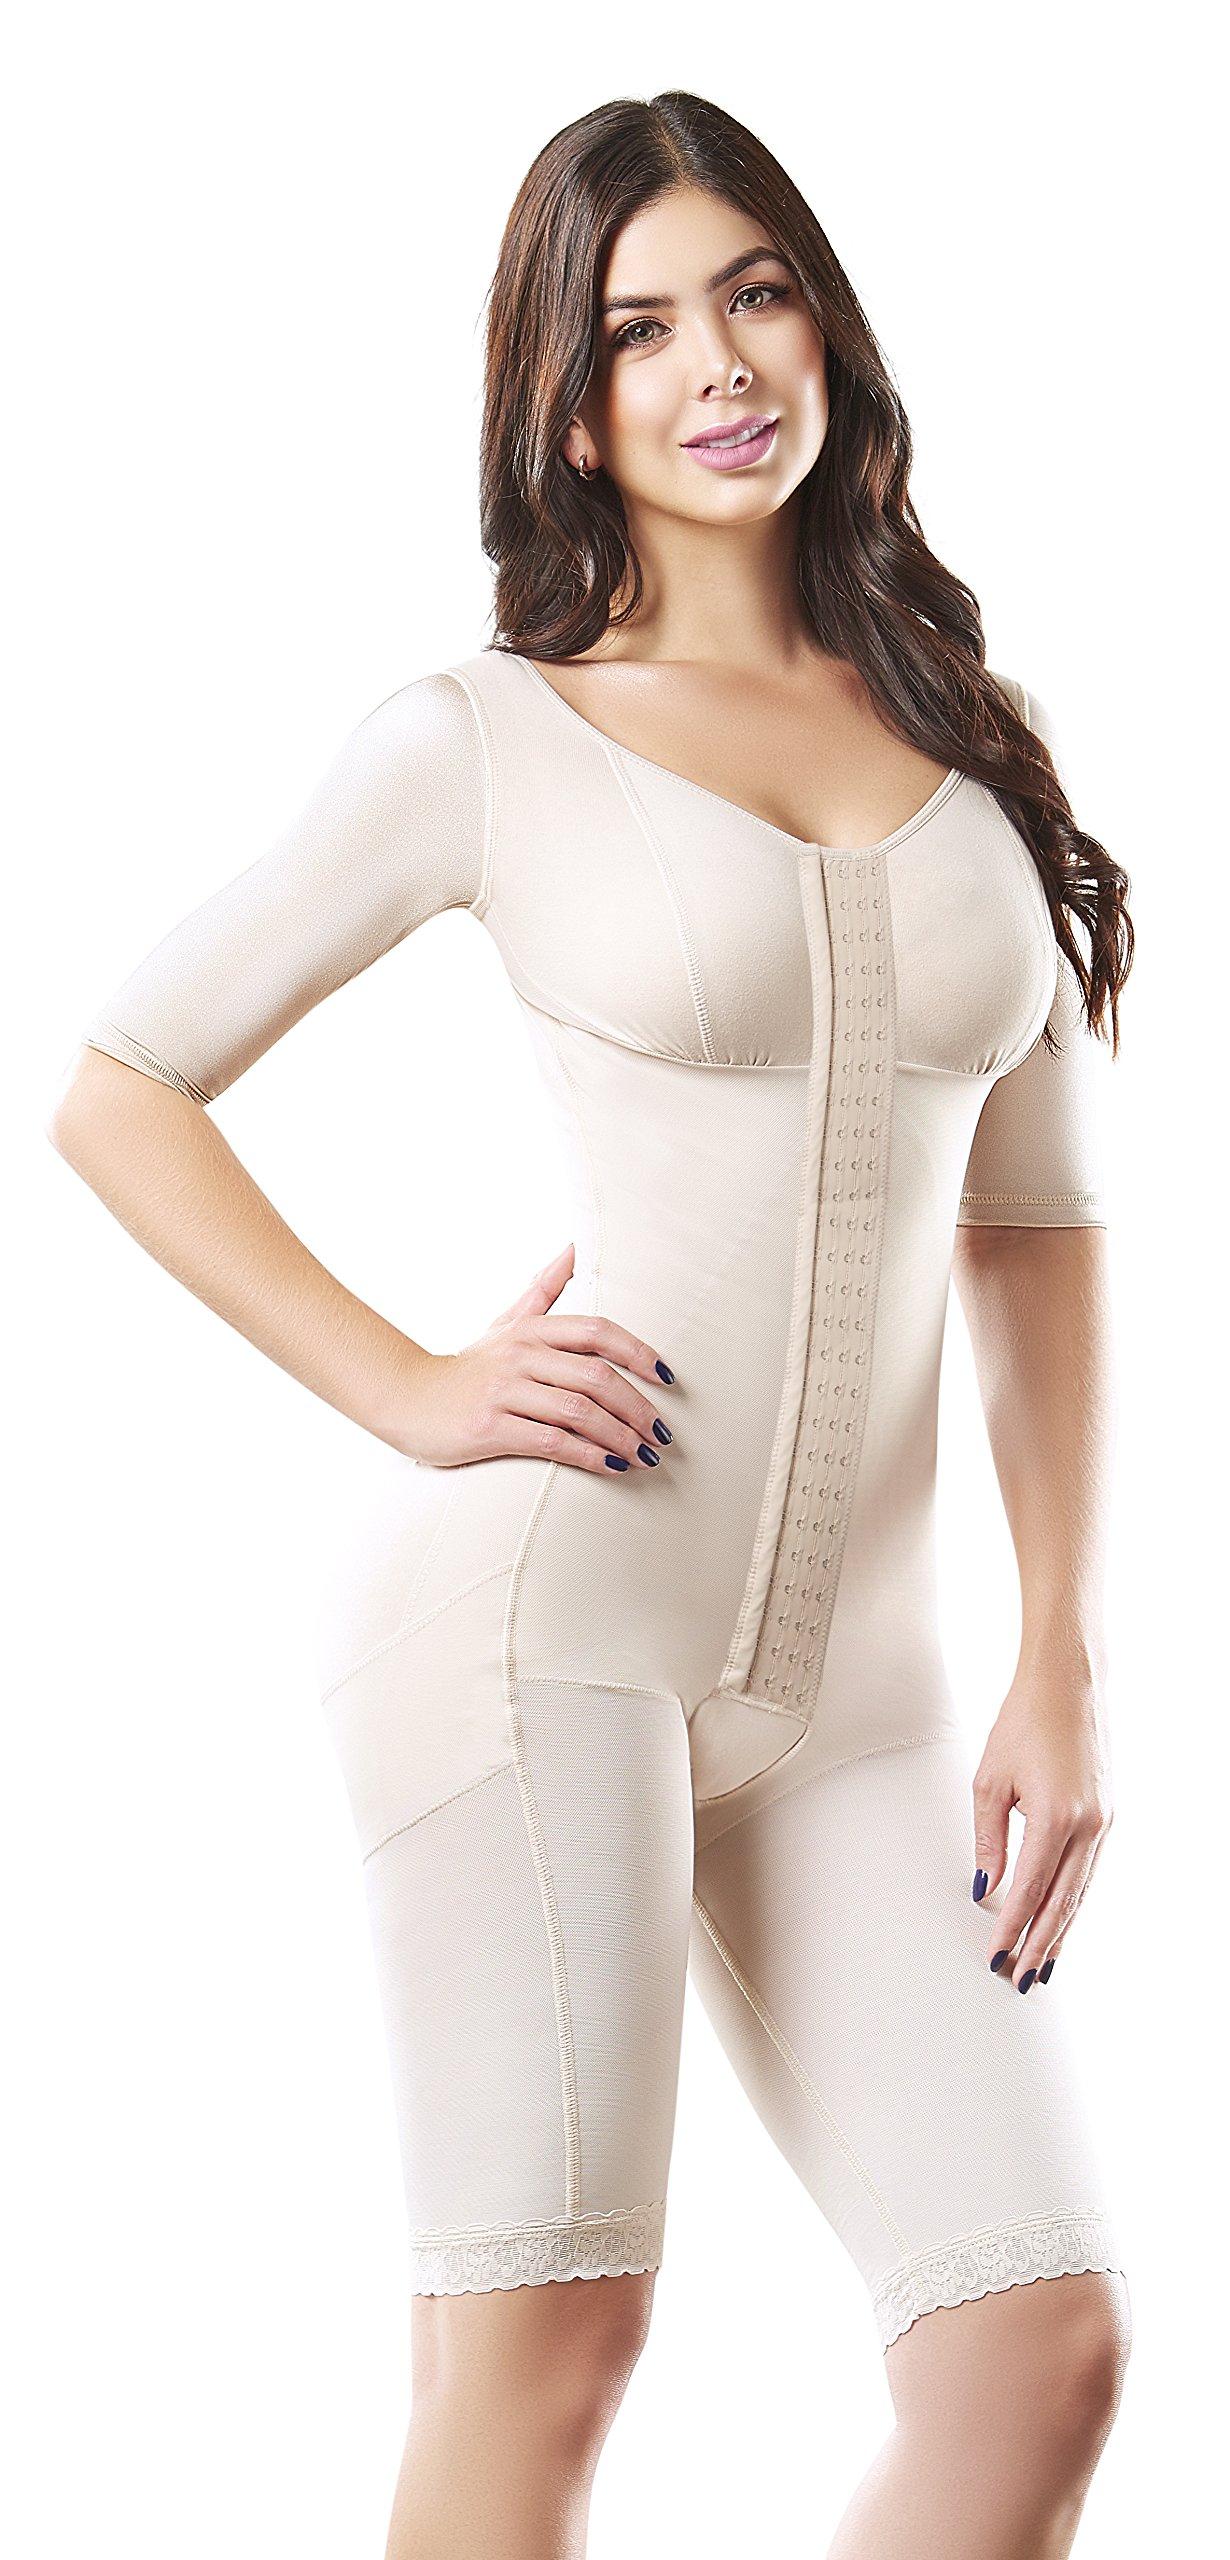 Shape Concept Fajas Colombianas Reductoras y Moldeadoras High Compression Garments After Liposuction Full Bodysuit SCM0068